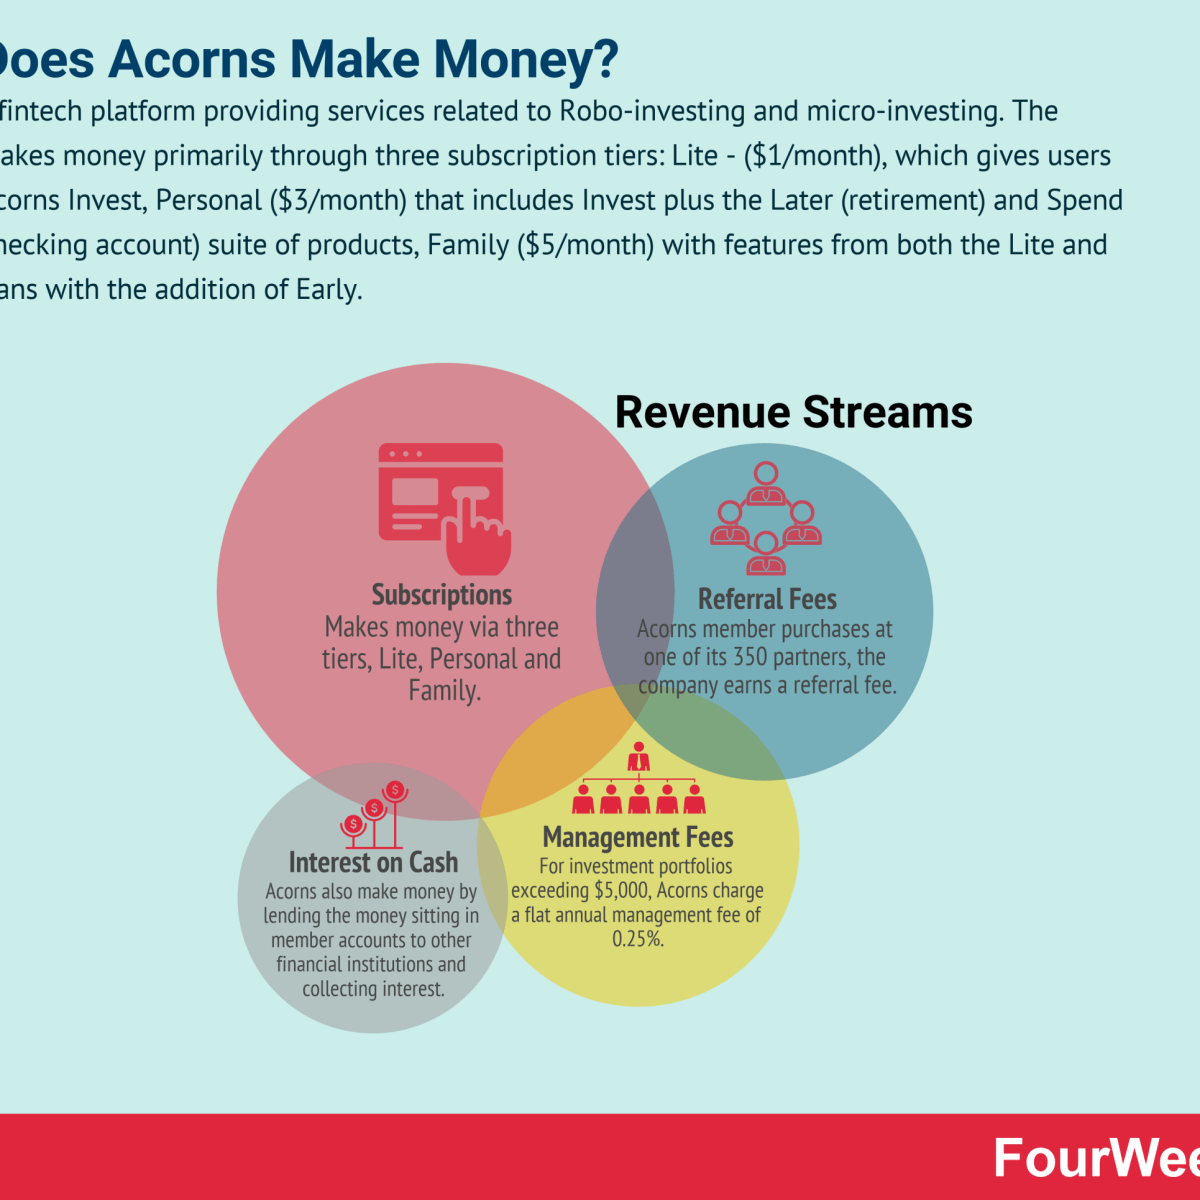 How Does Acorns Make Money?